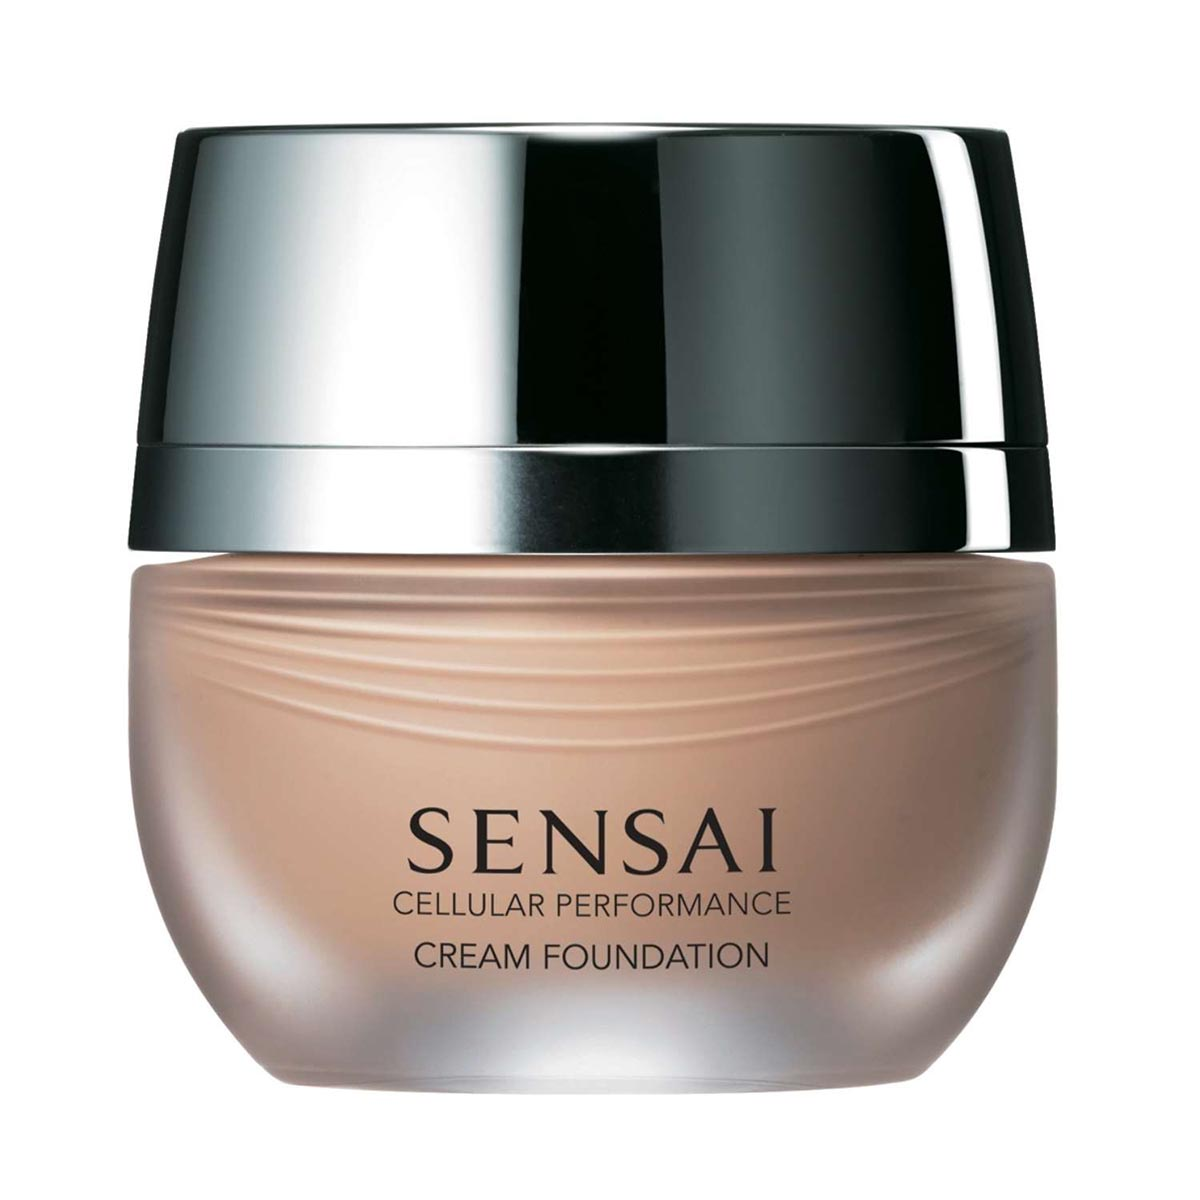 Kanebo sensai cellular performance cream foundation 13